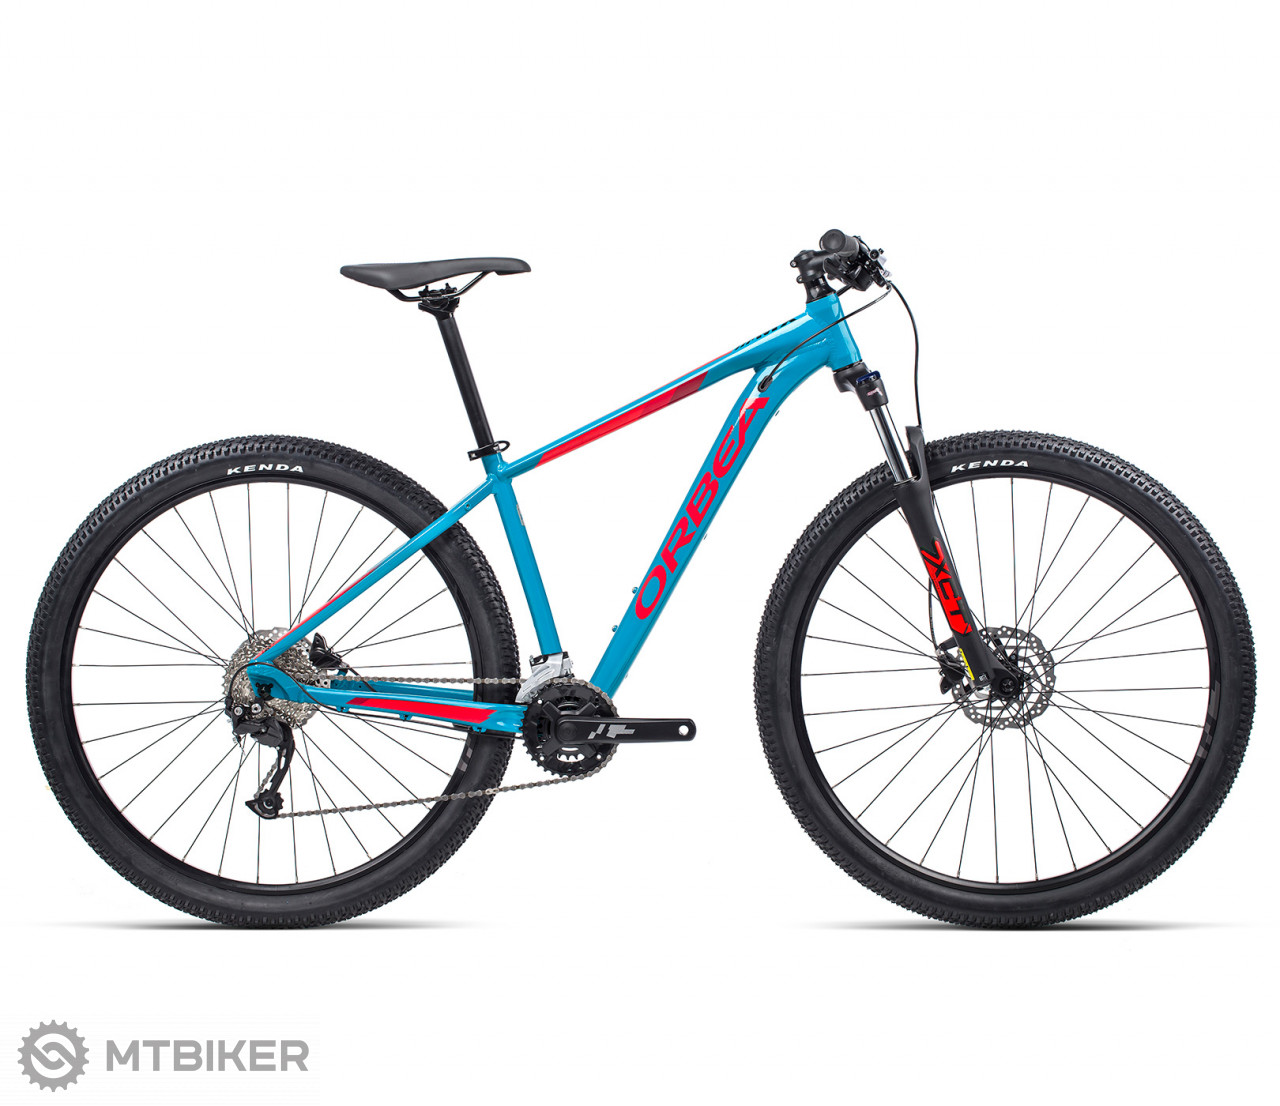 Orbea MX 29 40, model 2021